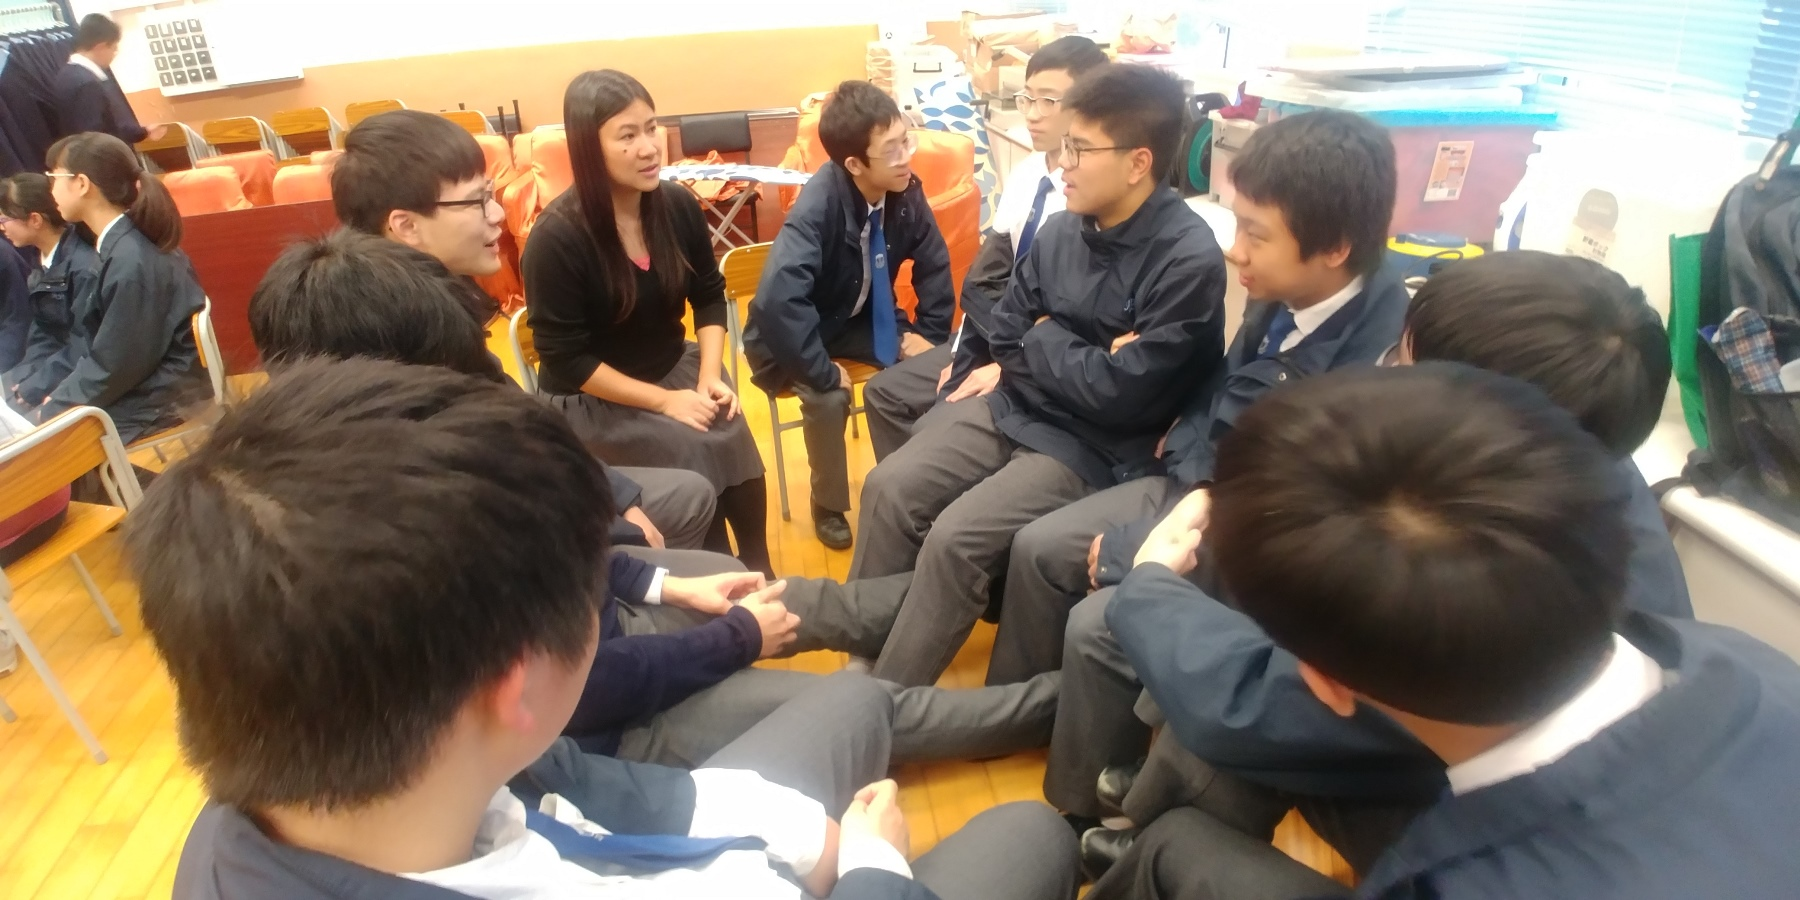 http://npc.edu.hk/sites/default/files/20190110_164854.jpg